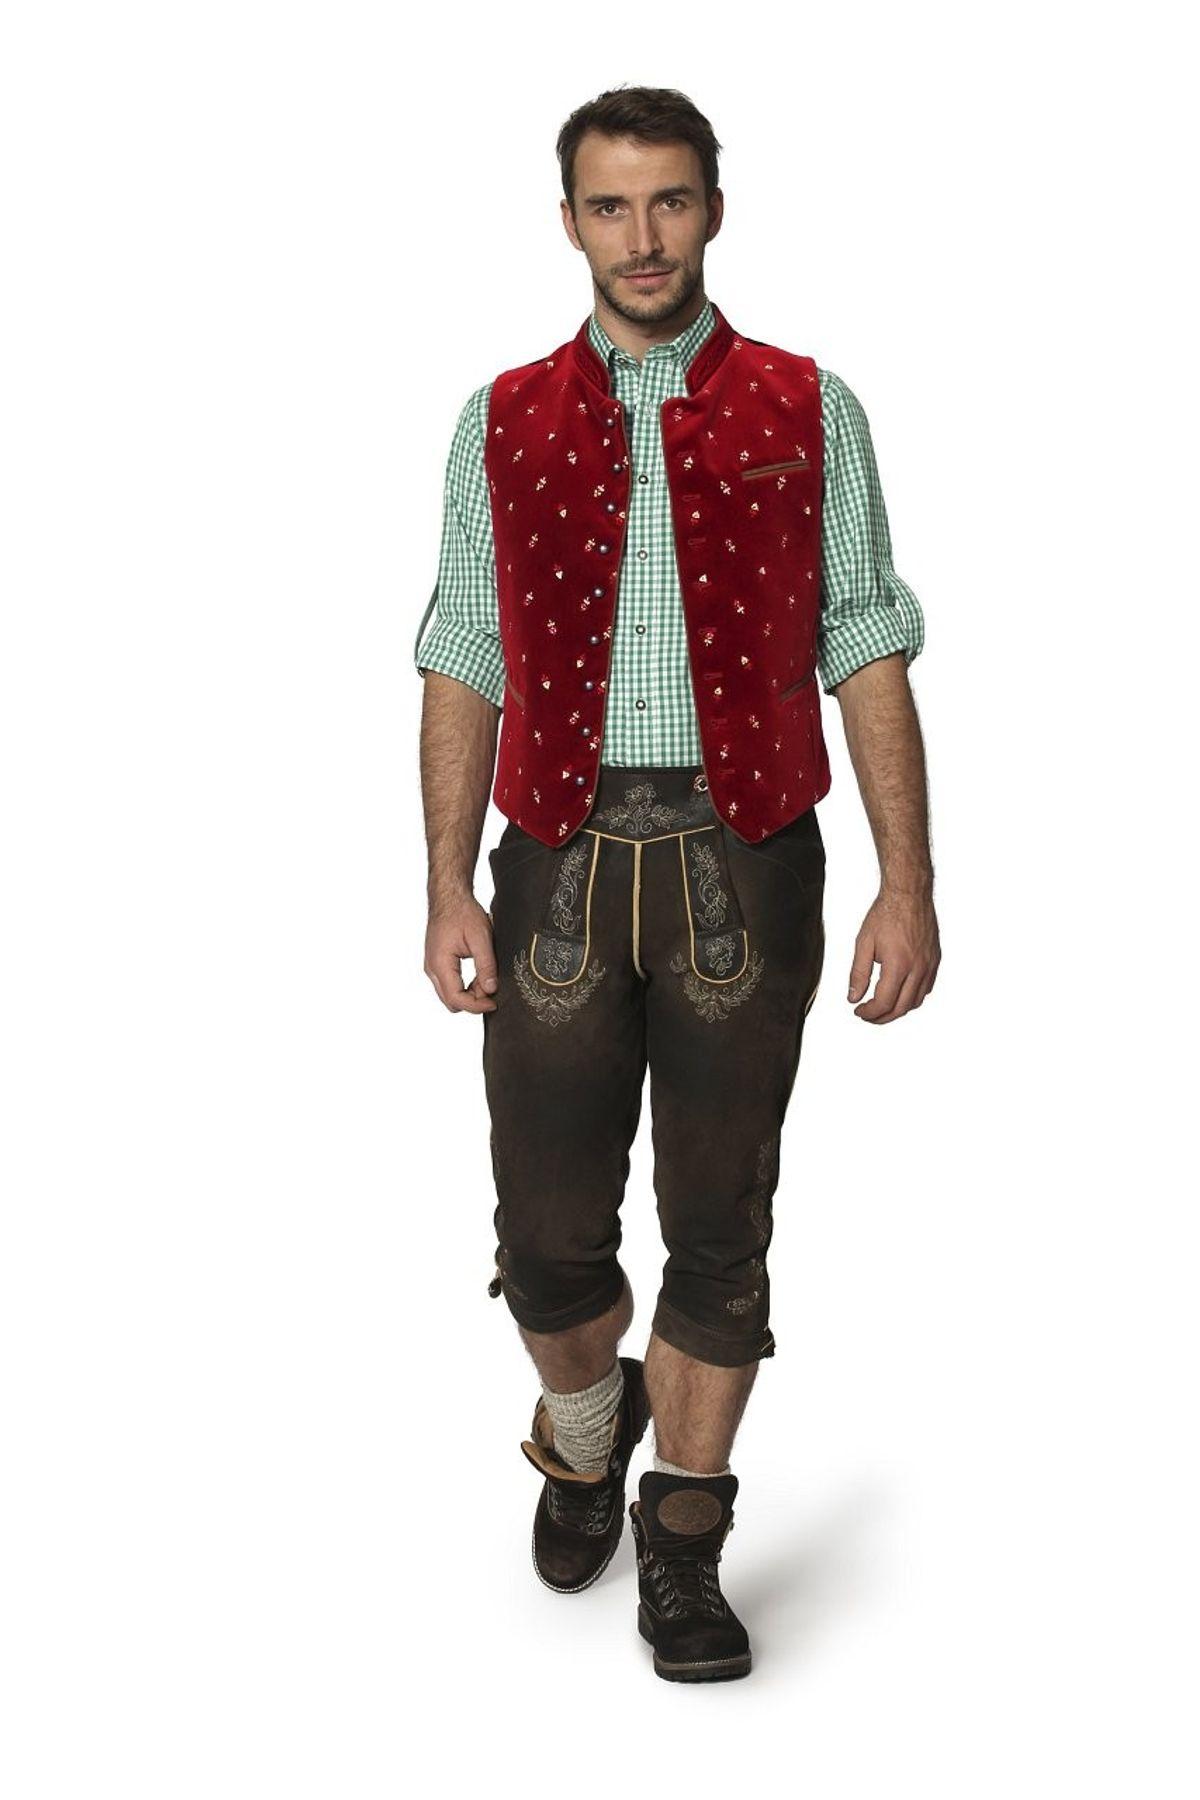 Stockerpoint - Herren Trachten Weste in verschiedenen Farbtönen, Calzado – Bild 7